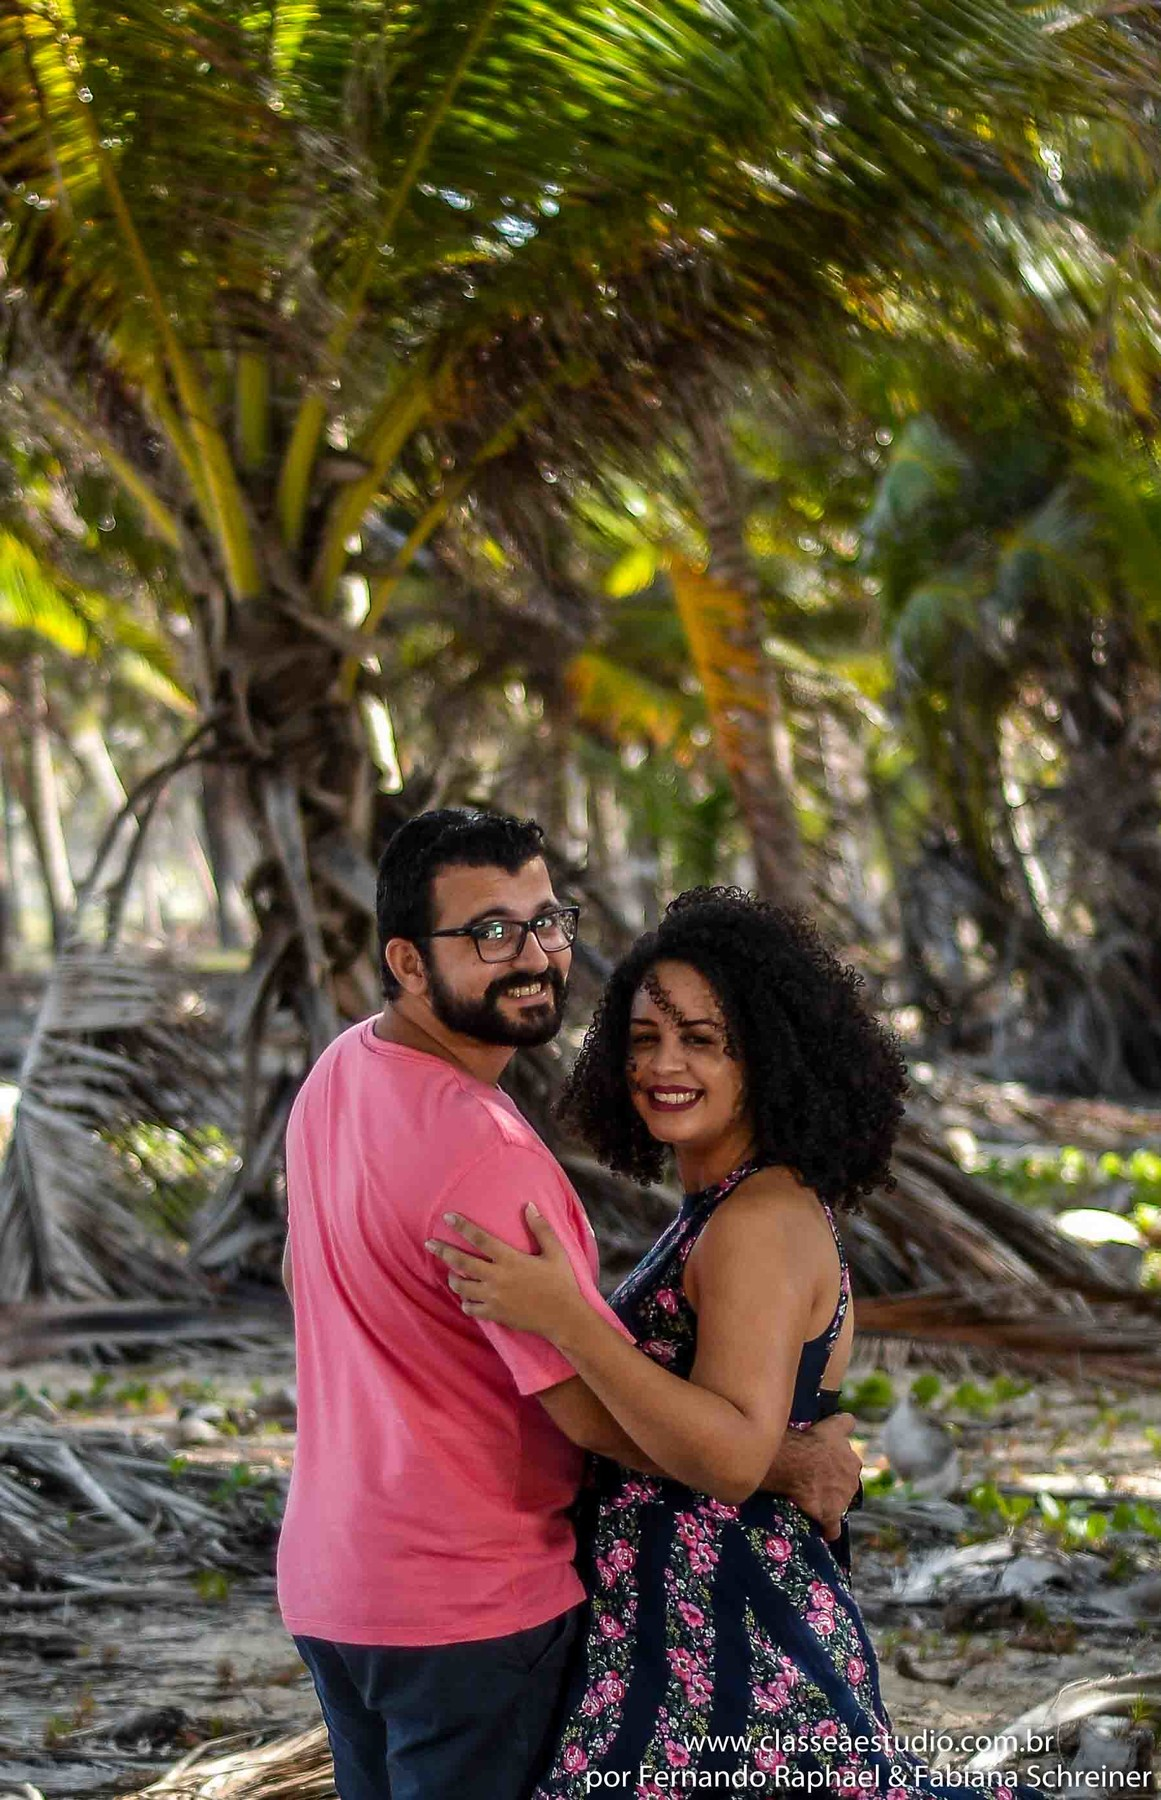 ensaios de casais ensaio fotografico de casal em recife zaiin